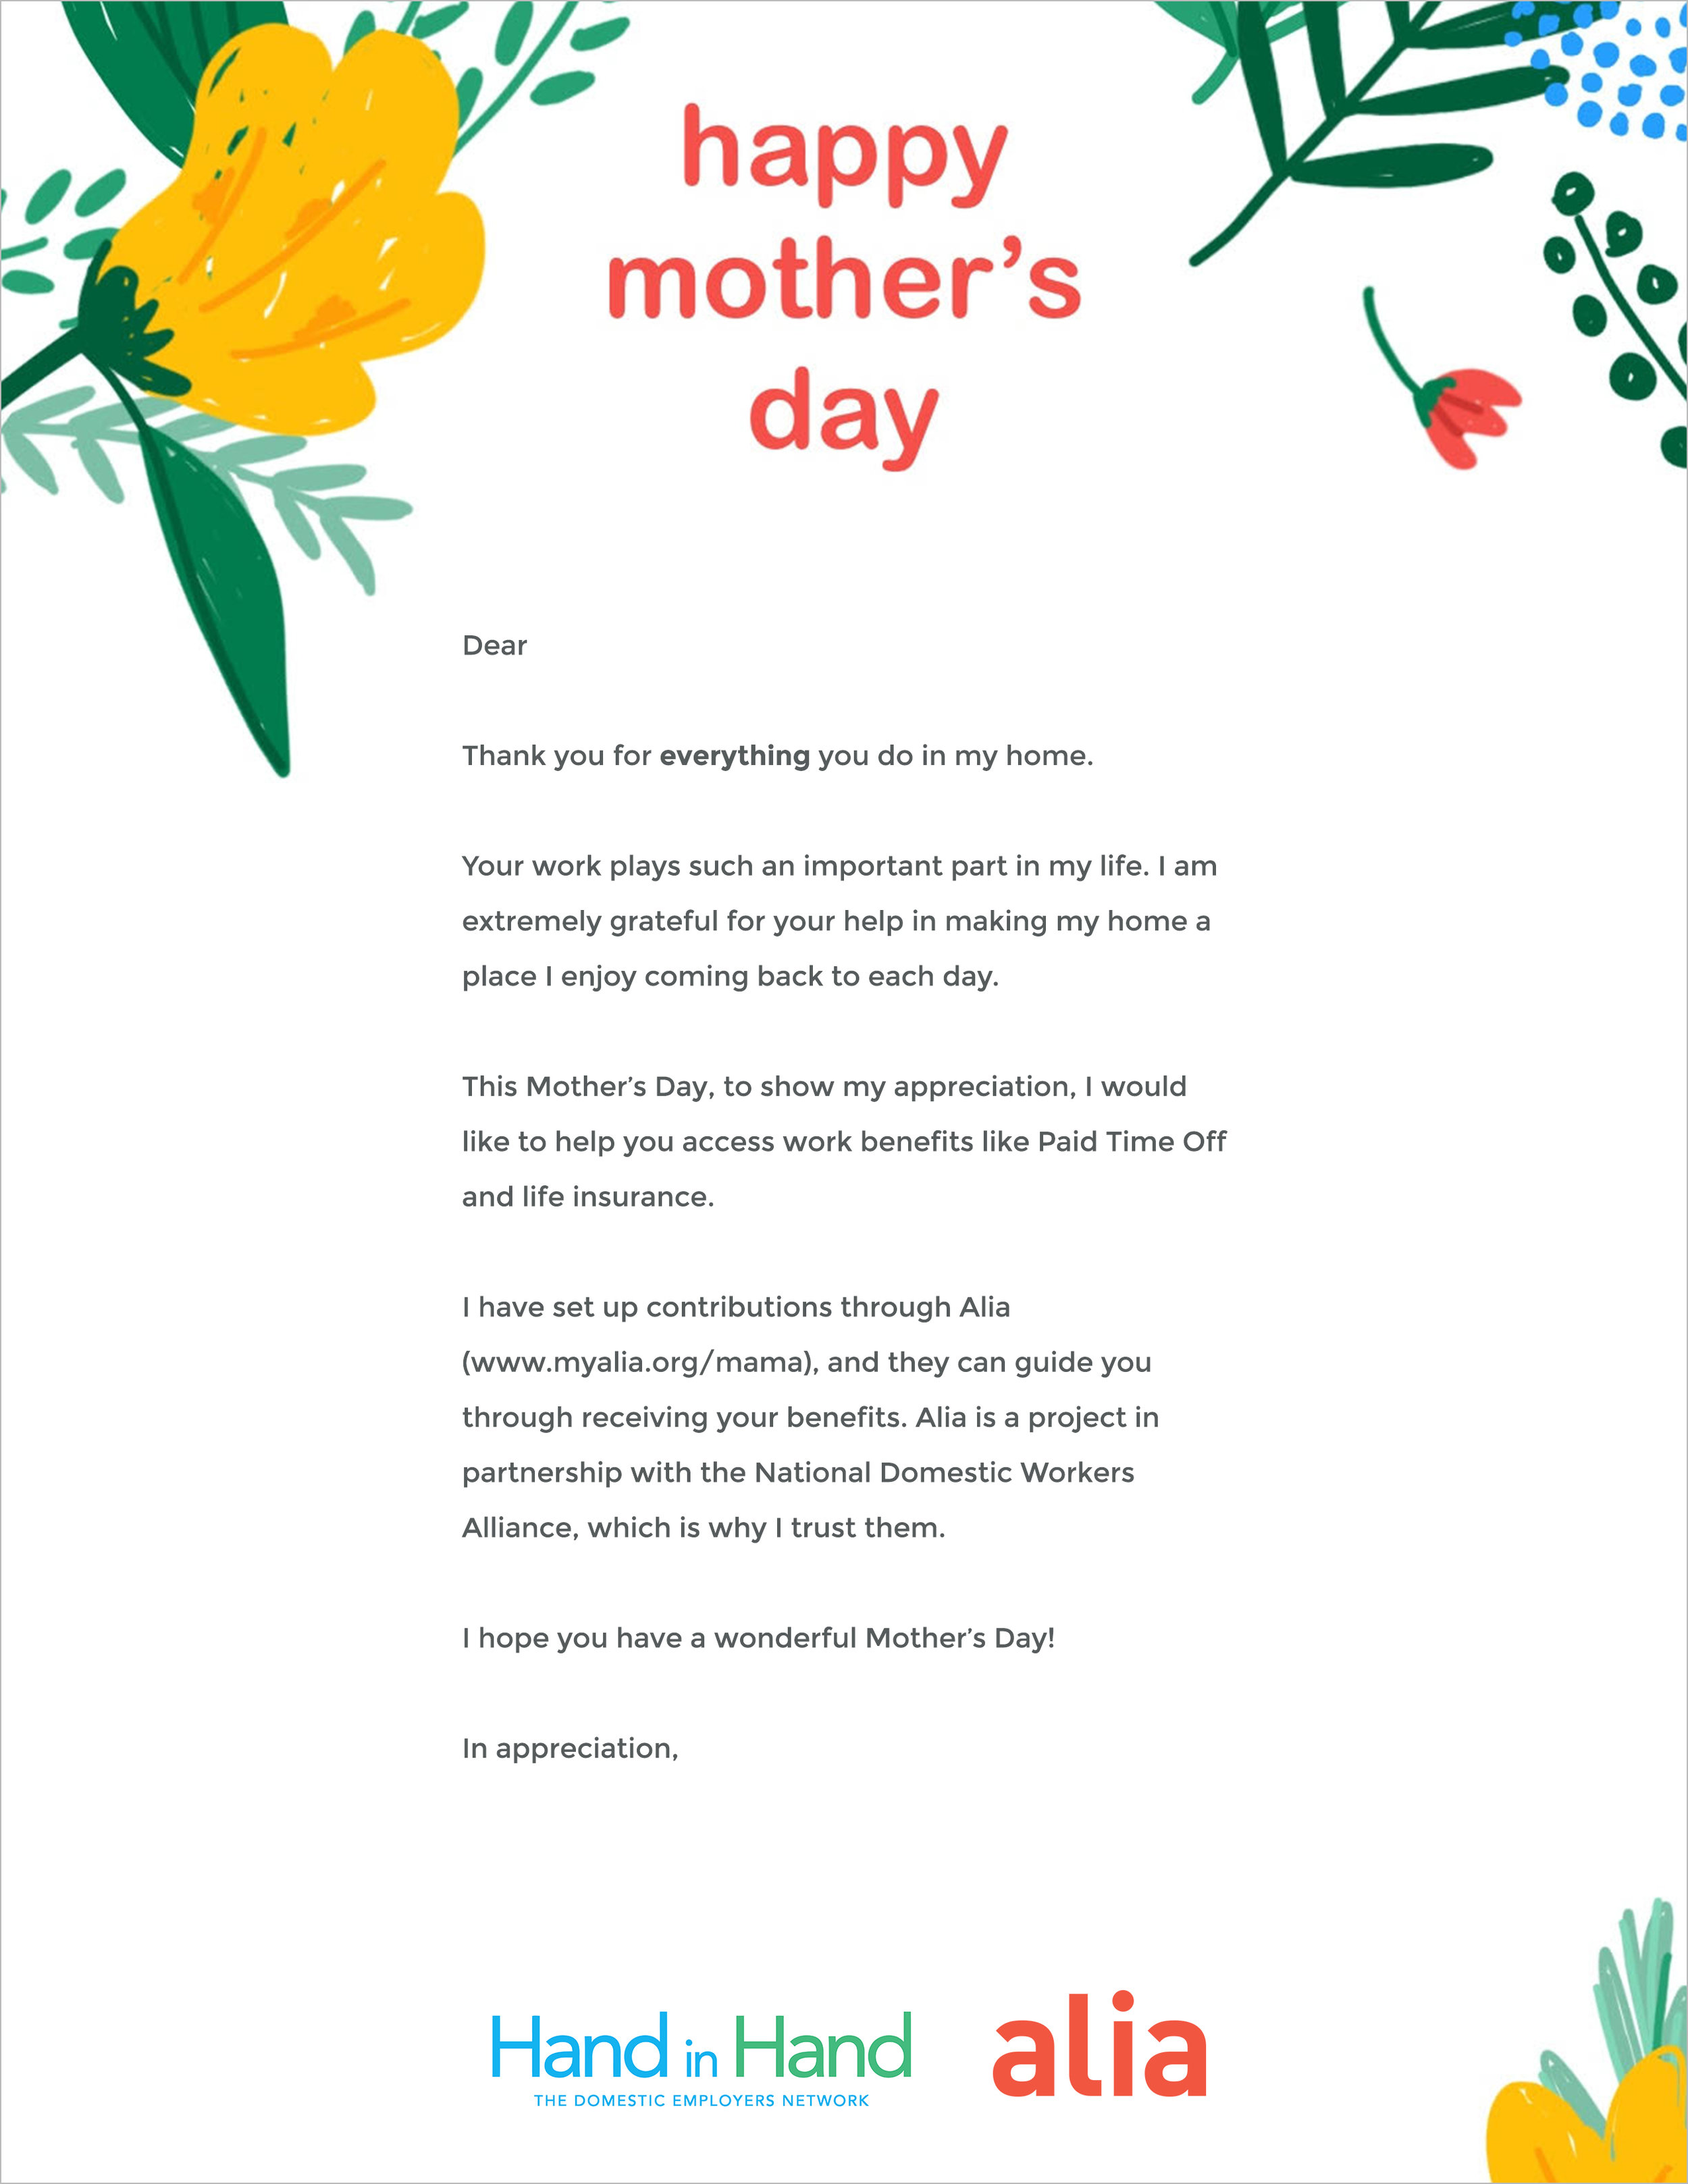 MothersDayCard_1_hih_SS_English.jpg